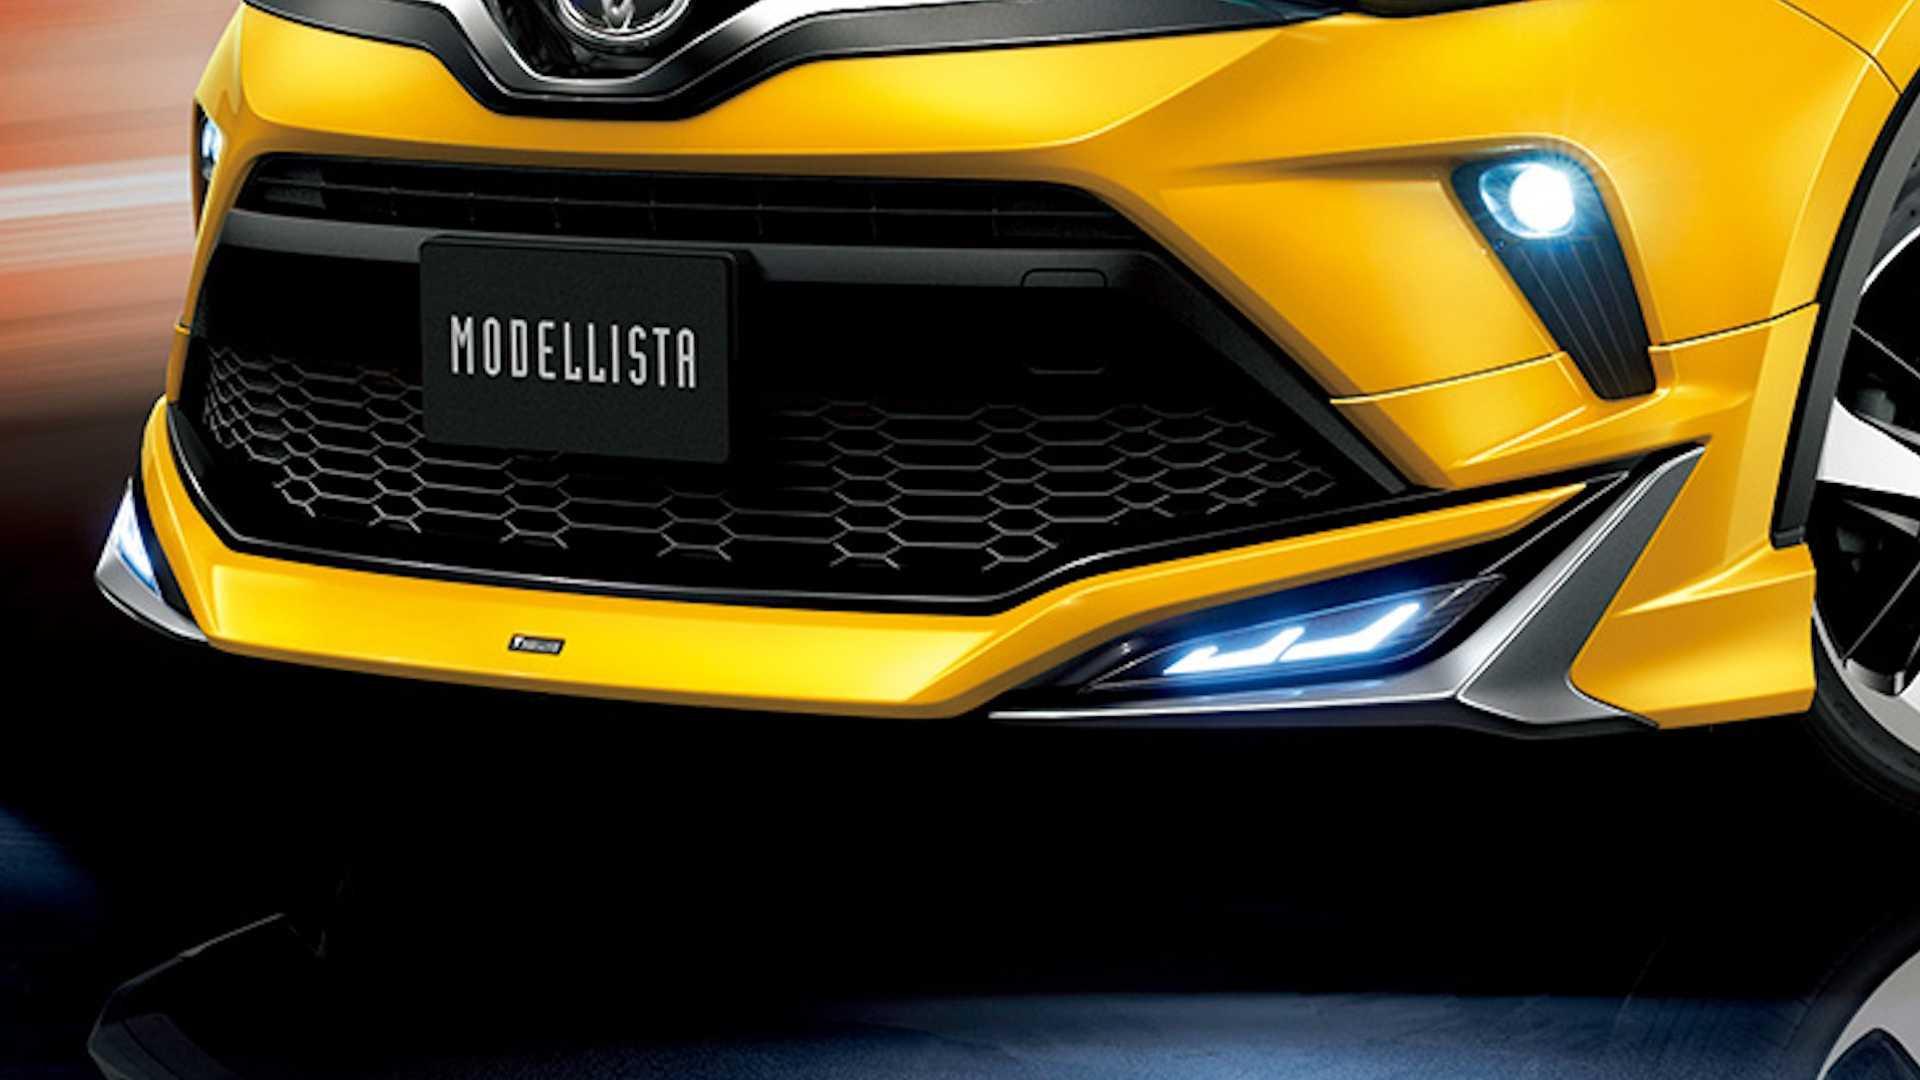 Gaya Agresif Modellista untuk Toyota C-HR